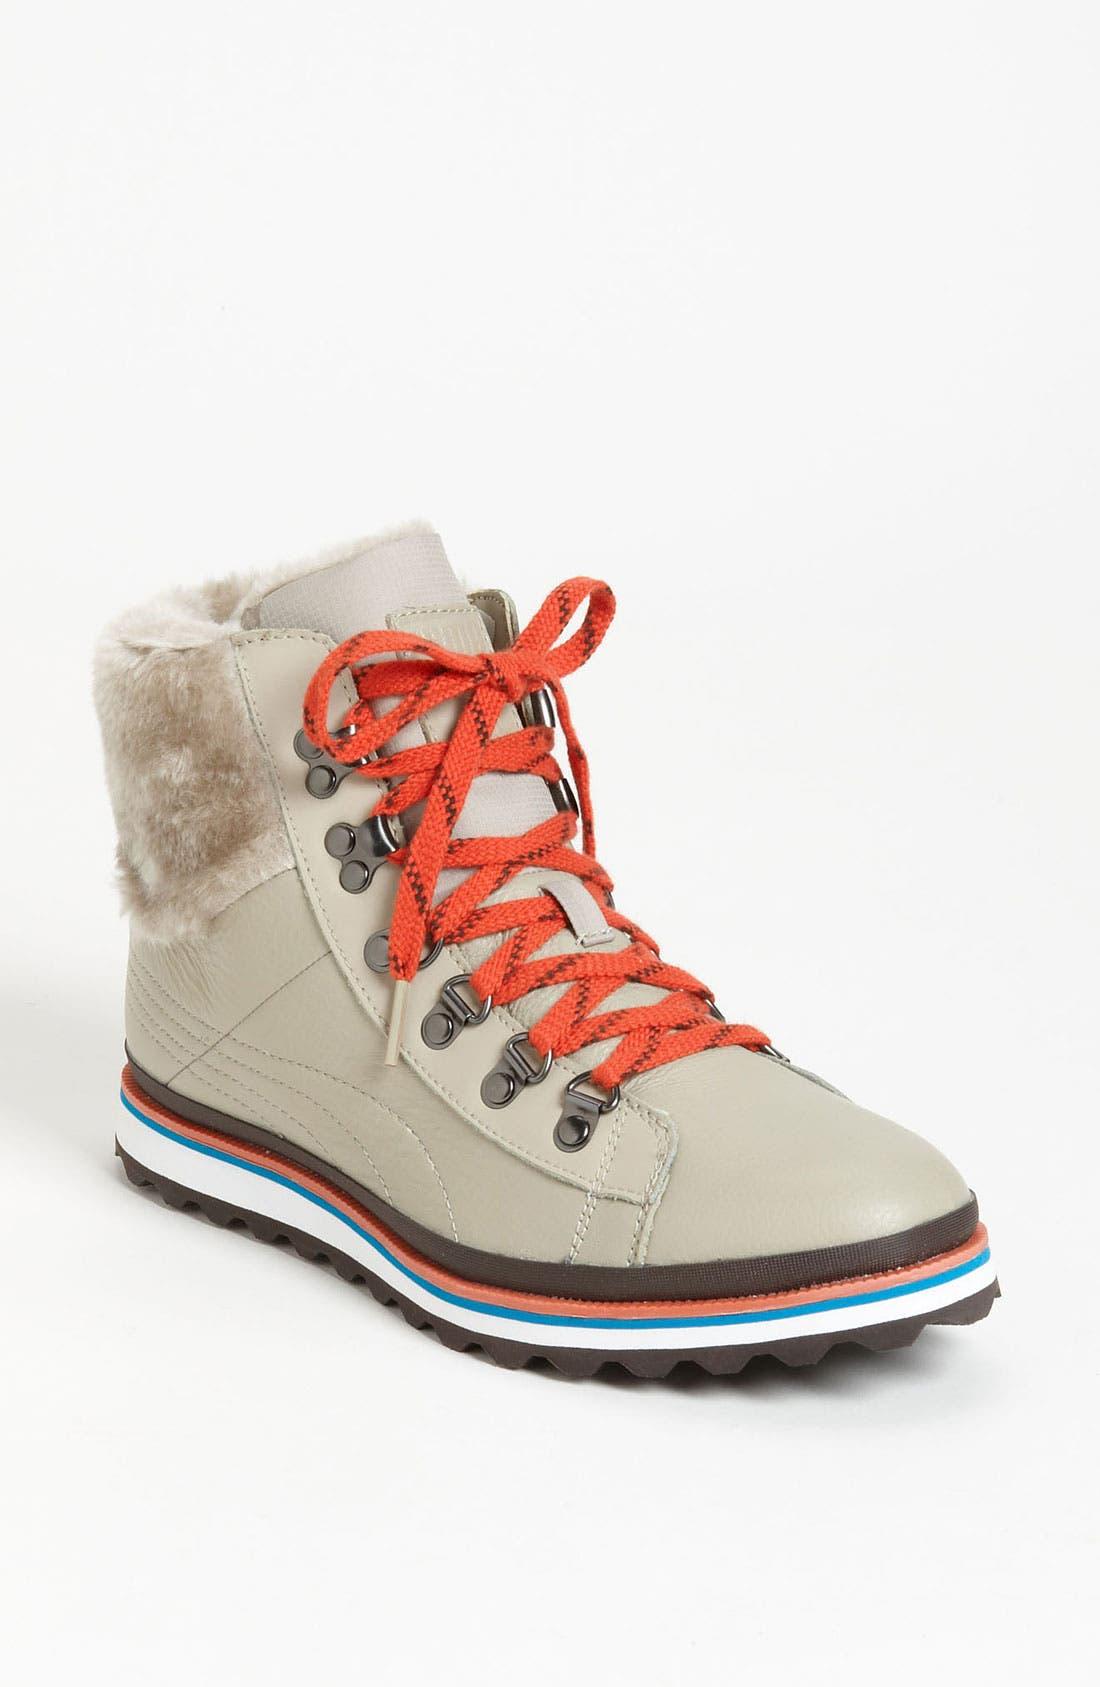 Alternate Image 1 Selected - PUMA 'City' Snow Boot